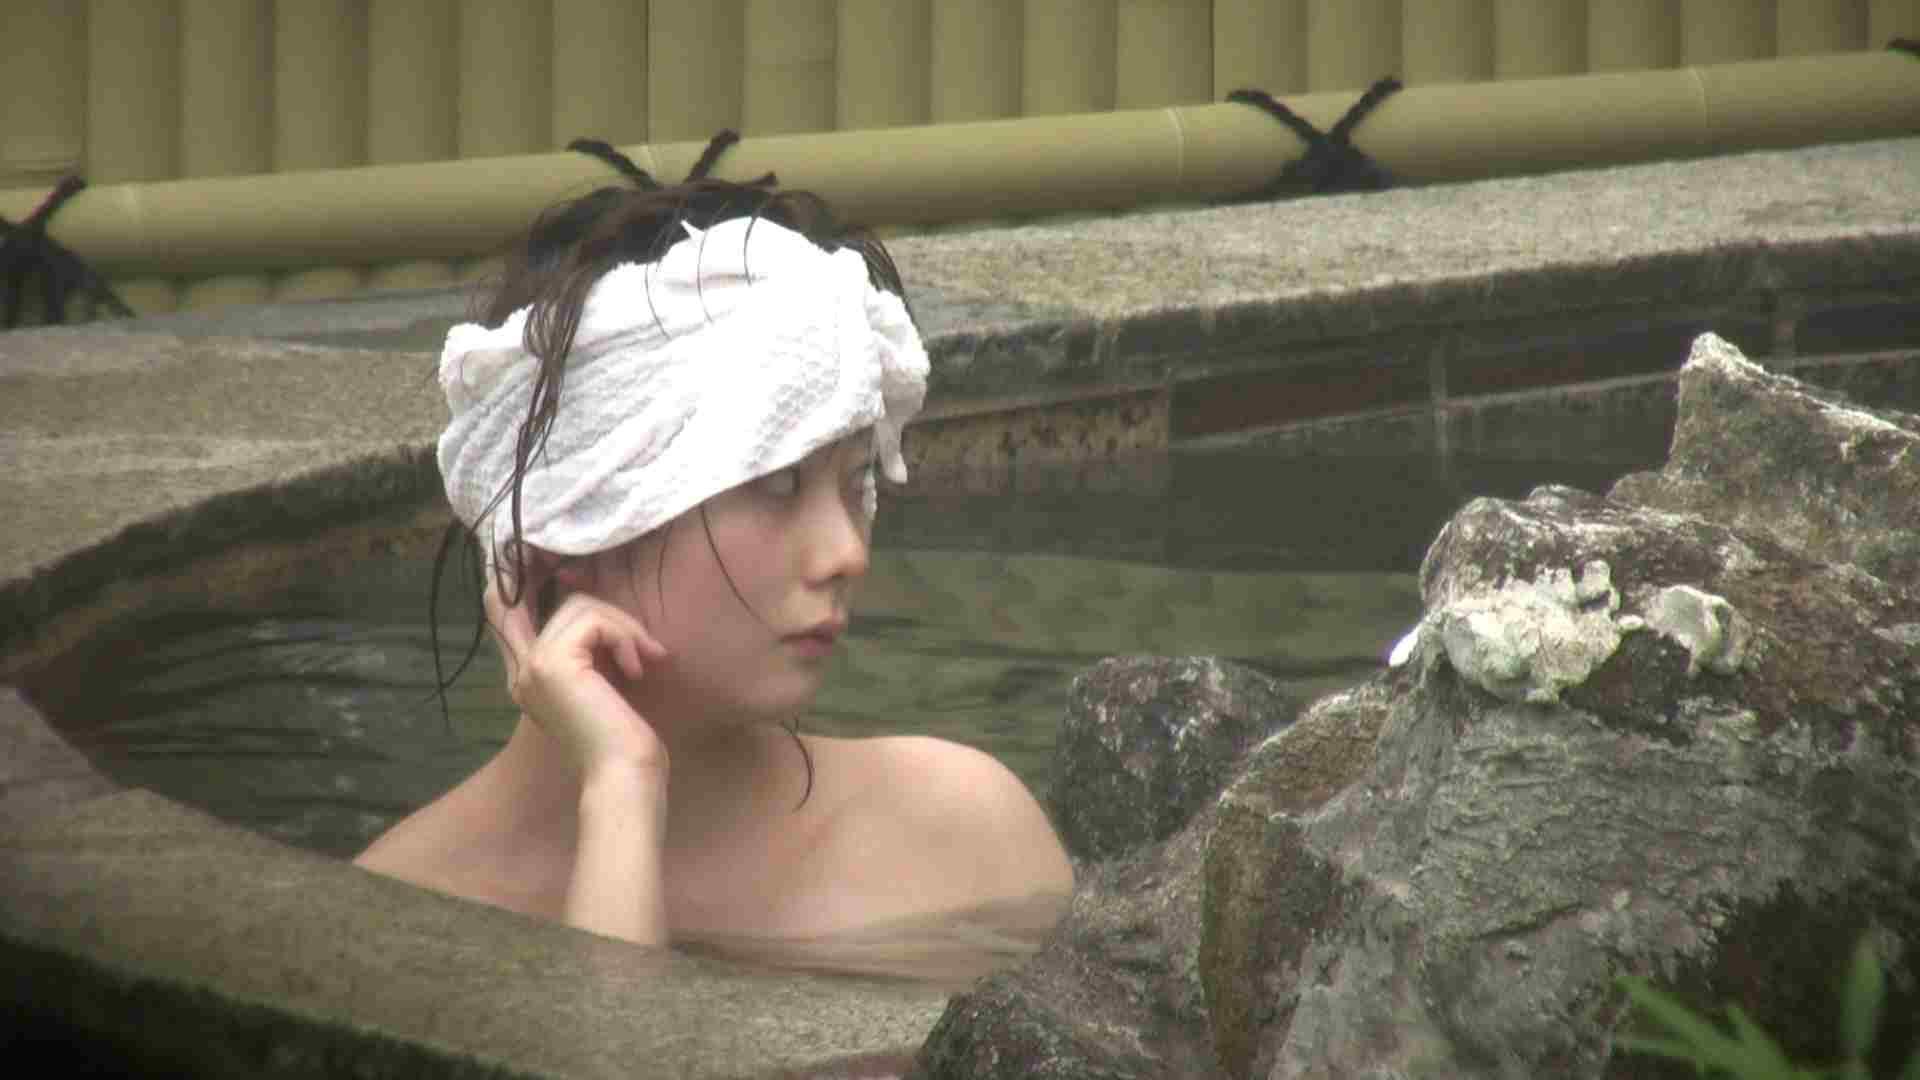 Aquaな露天風呂Vol.147 HなOL | 露天  103pic 46